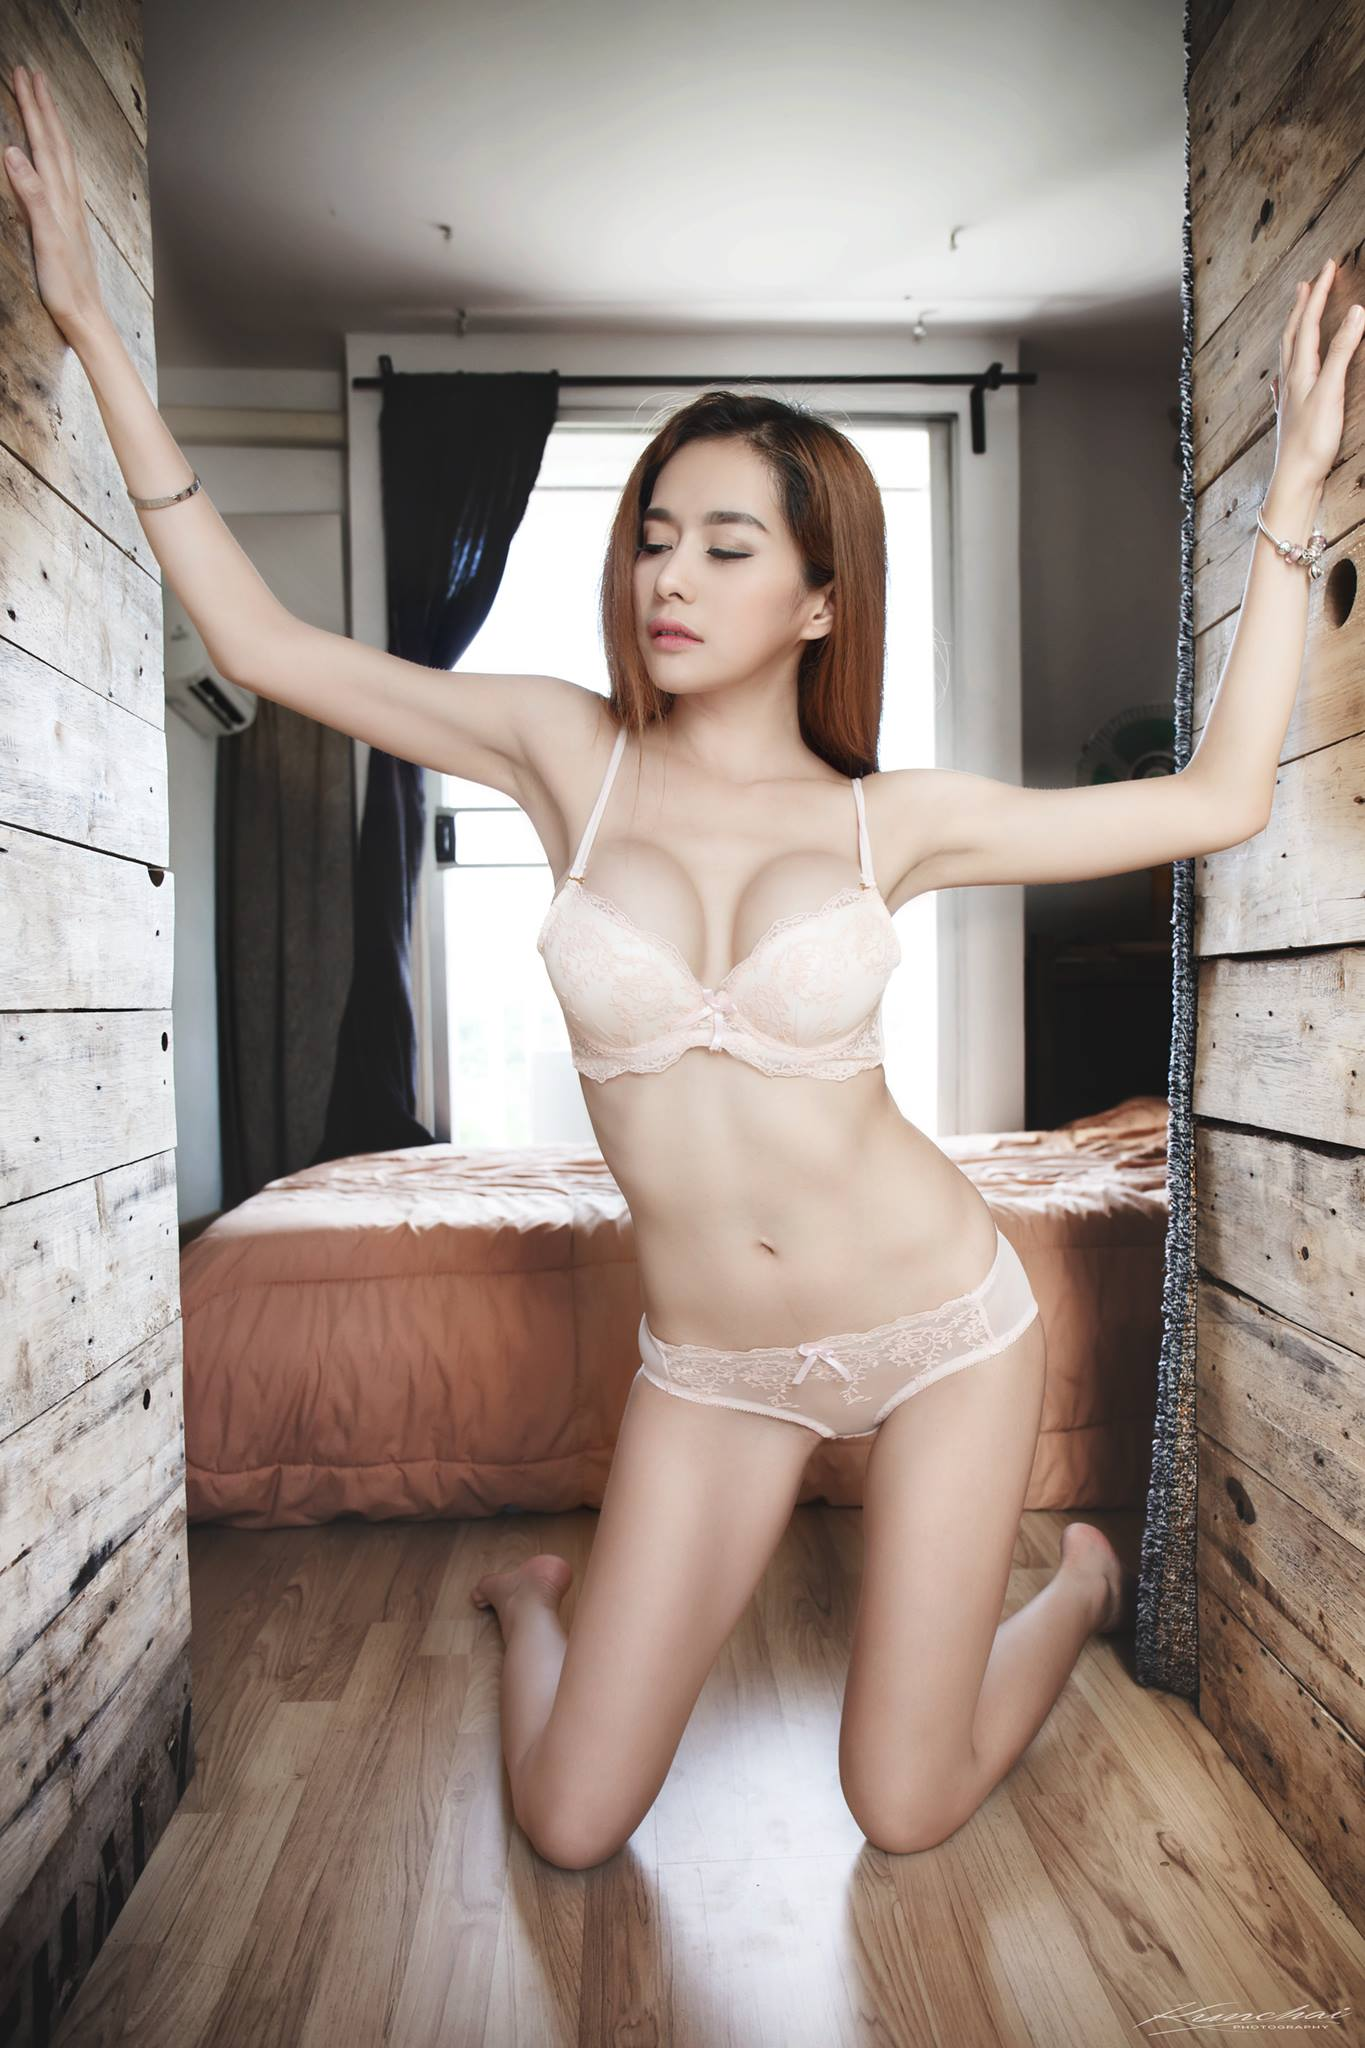 My Wooden Cabin - Damiran Chaiwong ดามิรัน ไชยวงษ์